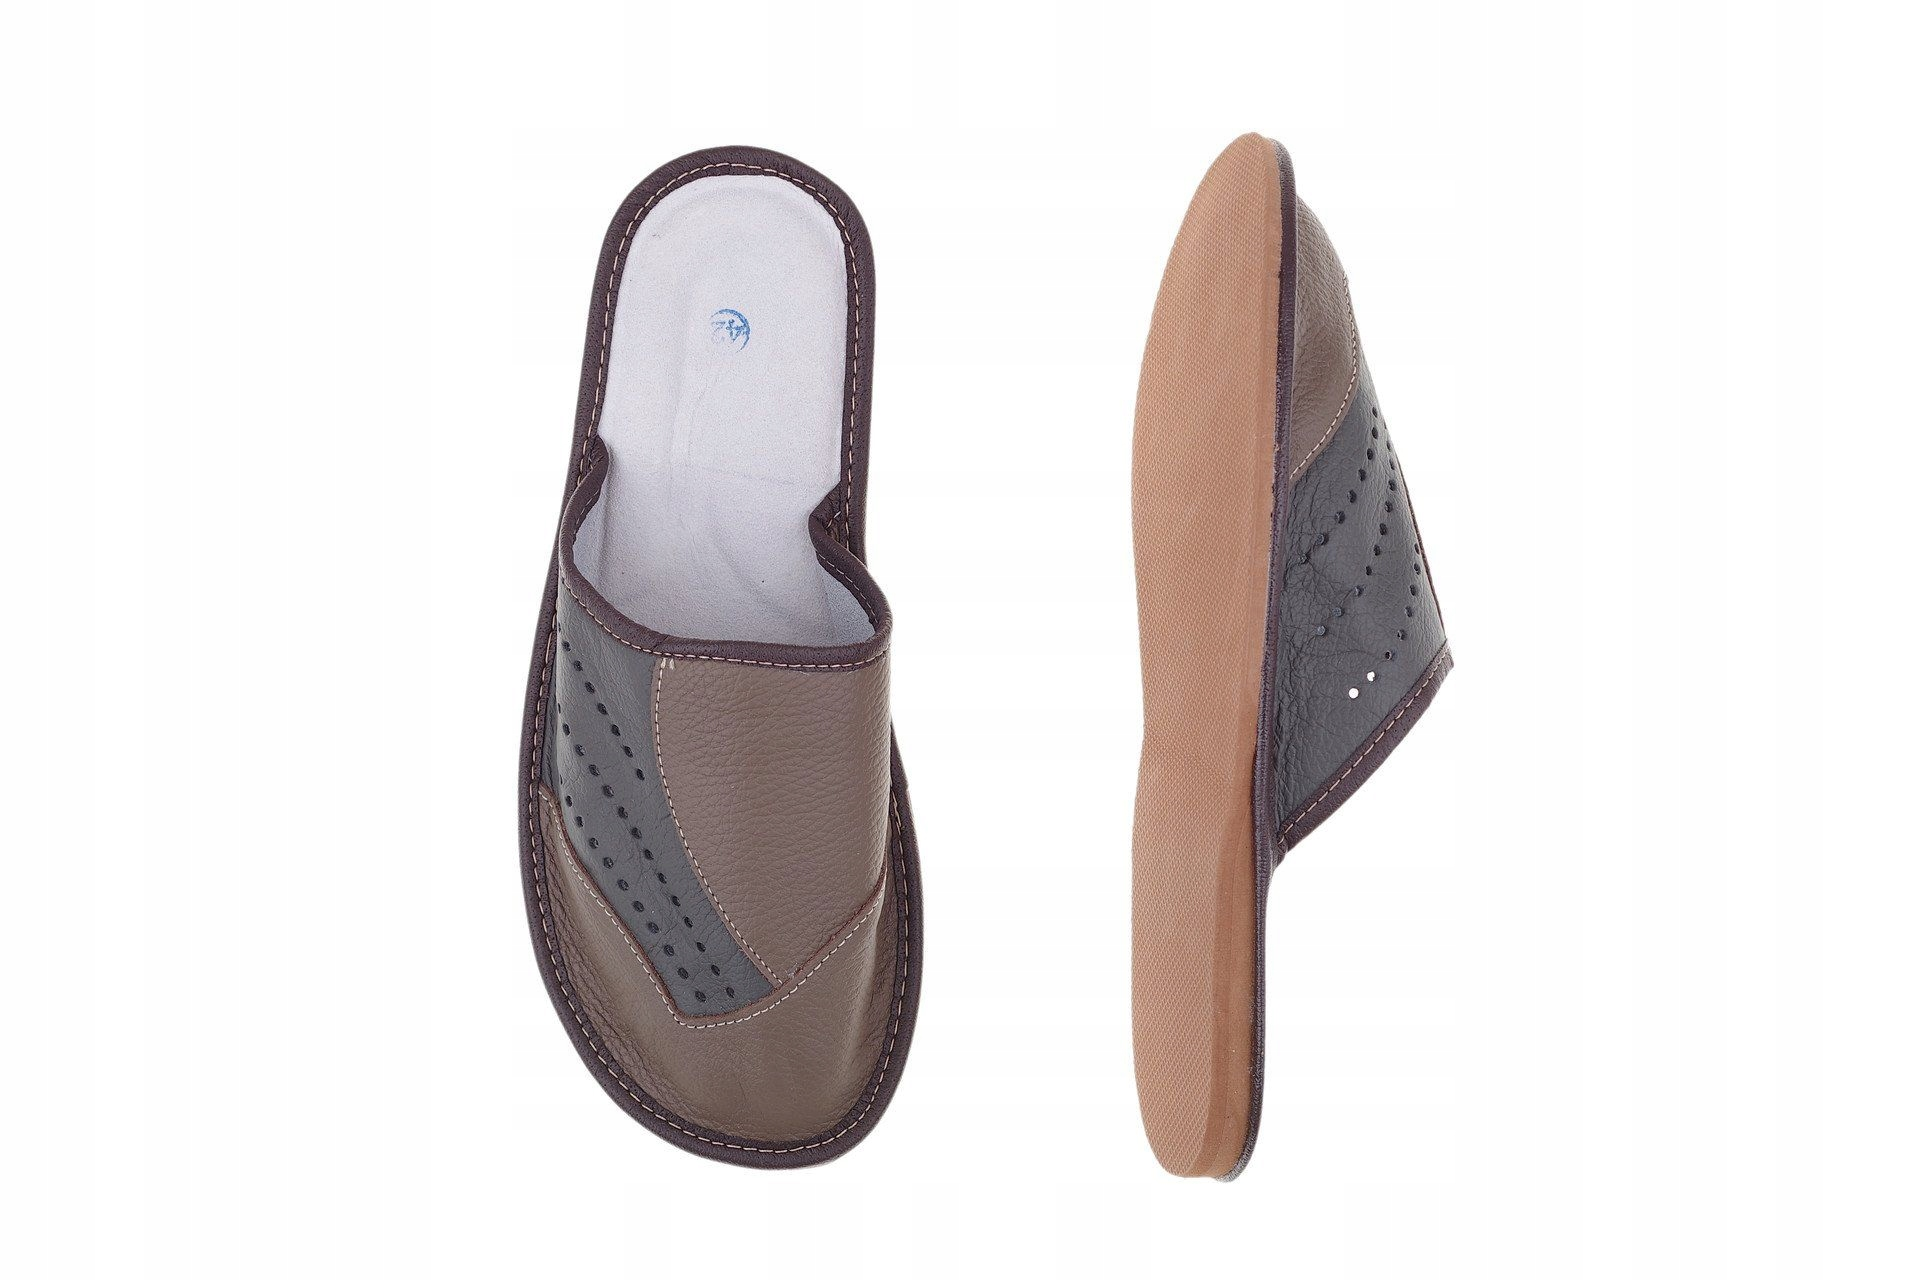 Kapcie skórzane profilowane pantofle kryte r. 43